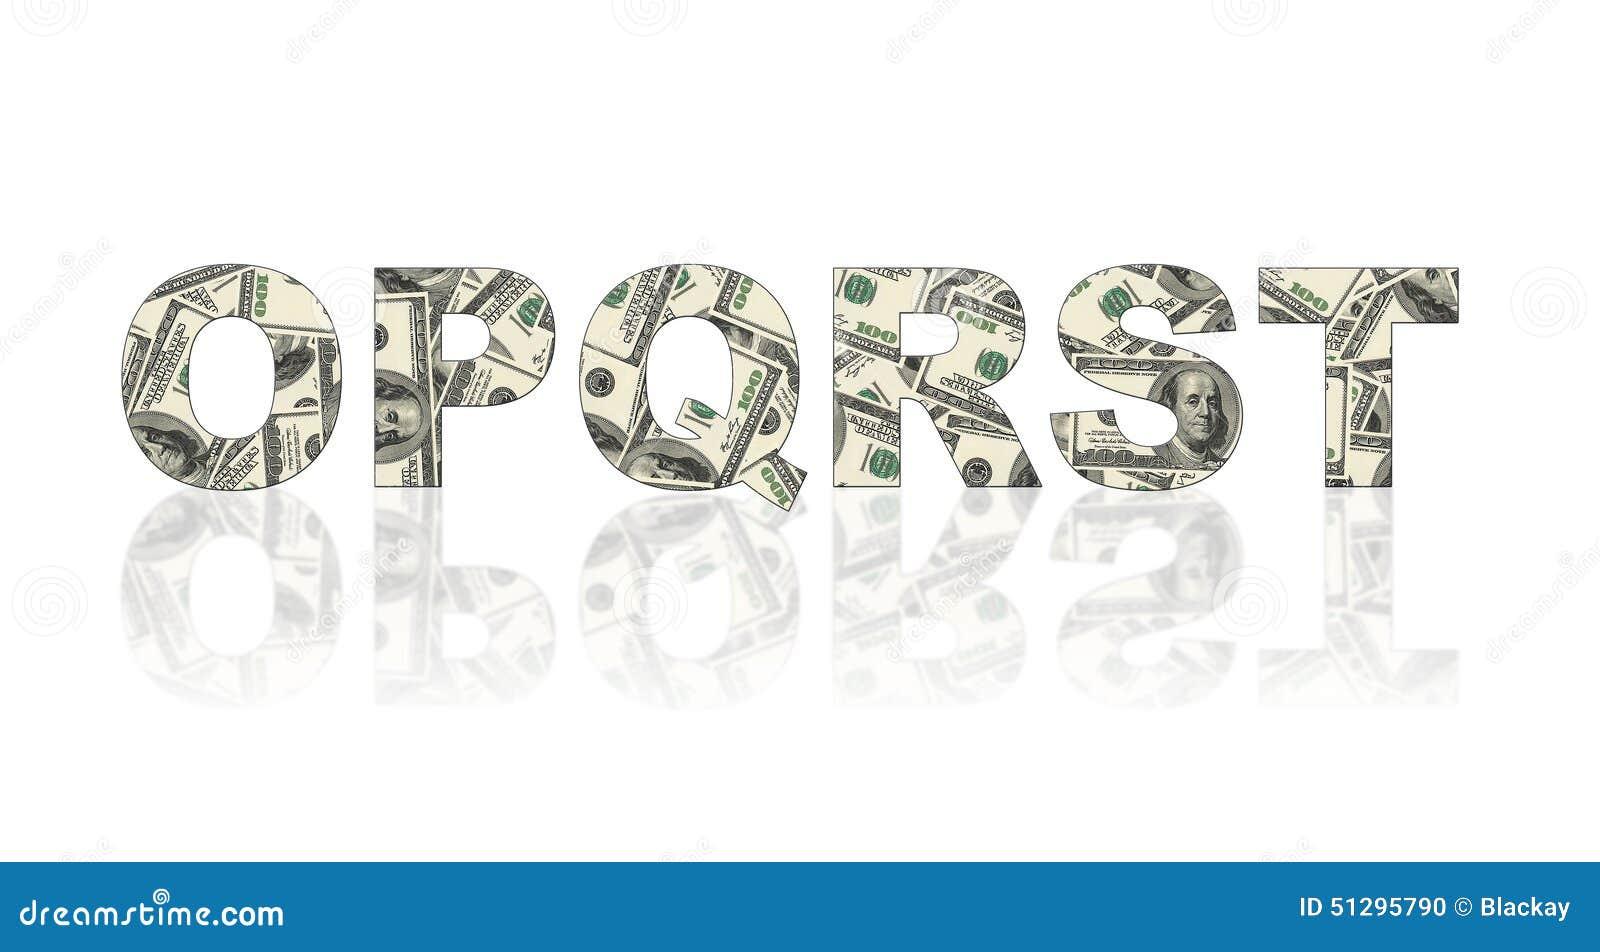 Latters Of Alphabet Made Of Dollars Stock Illustration - Image ...